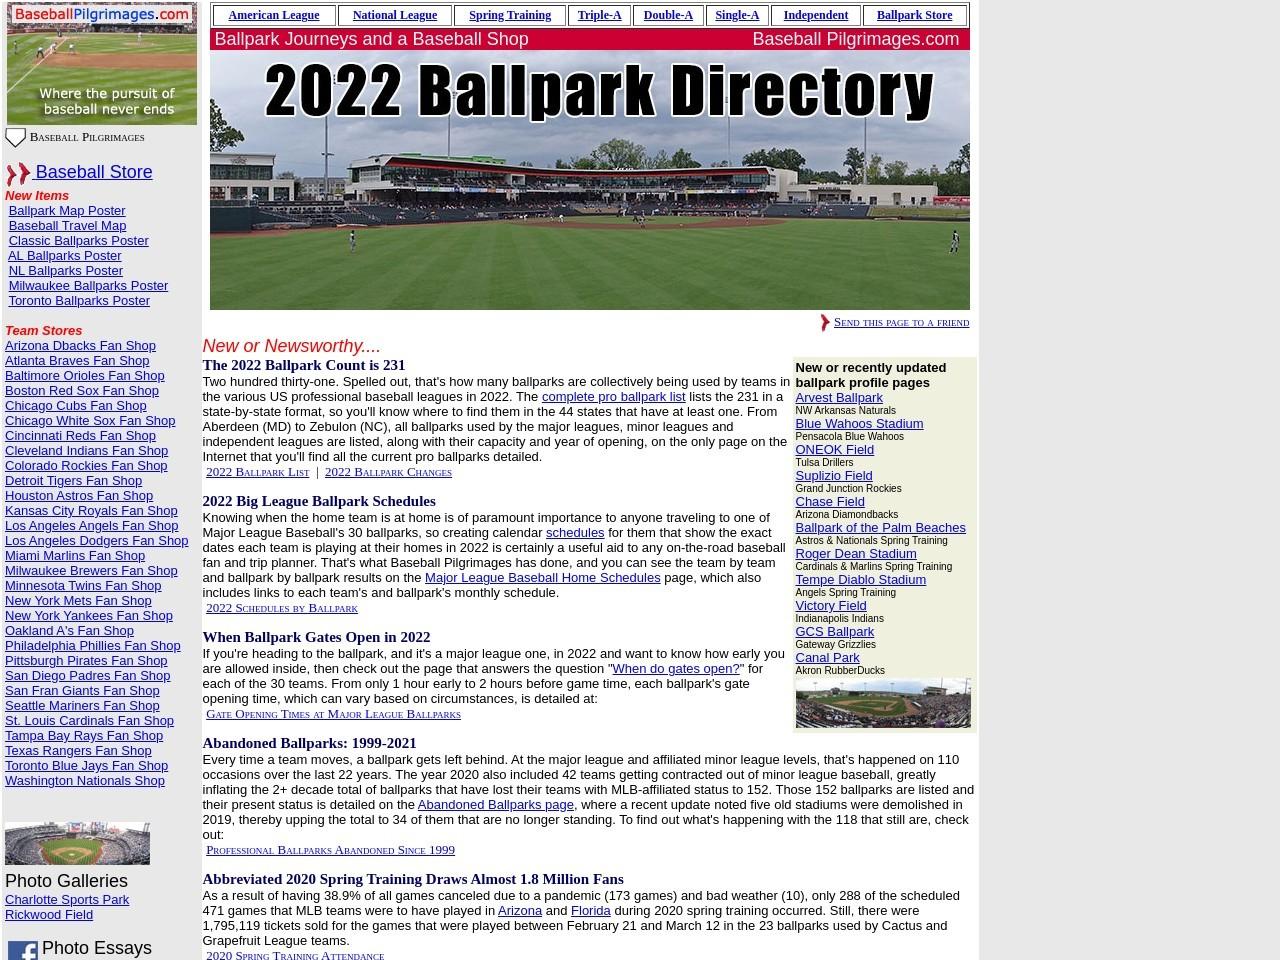 baseballpilgrimages.com